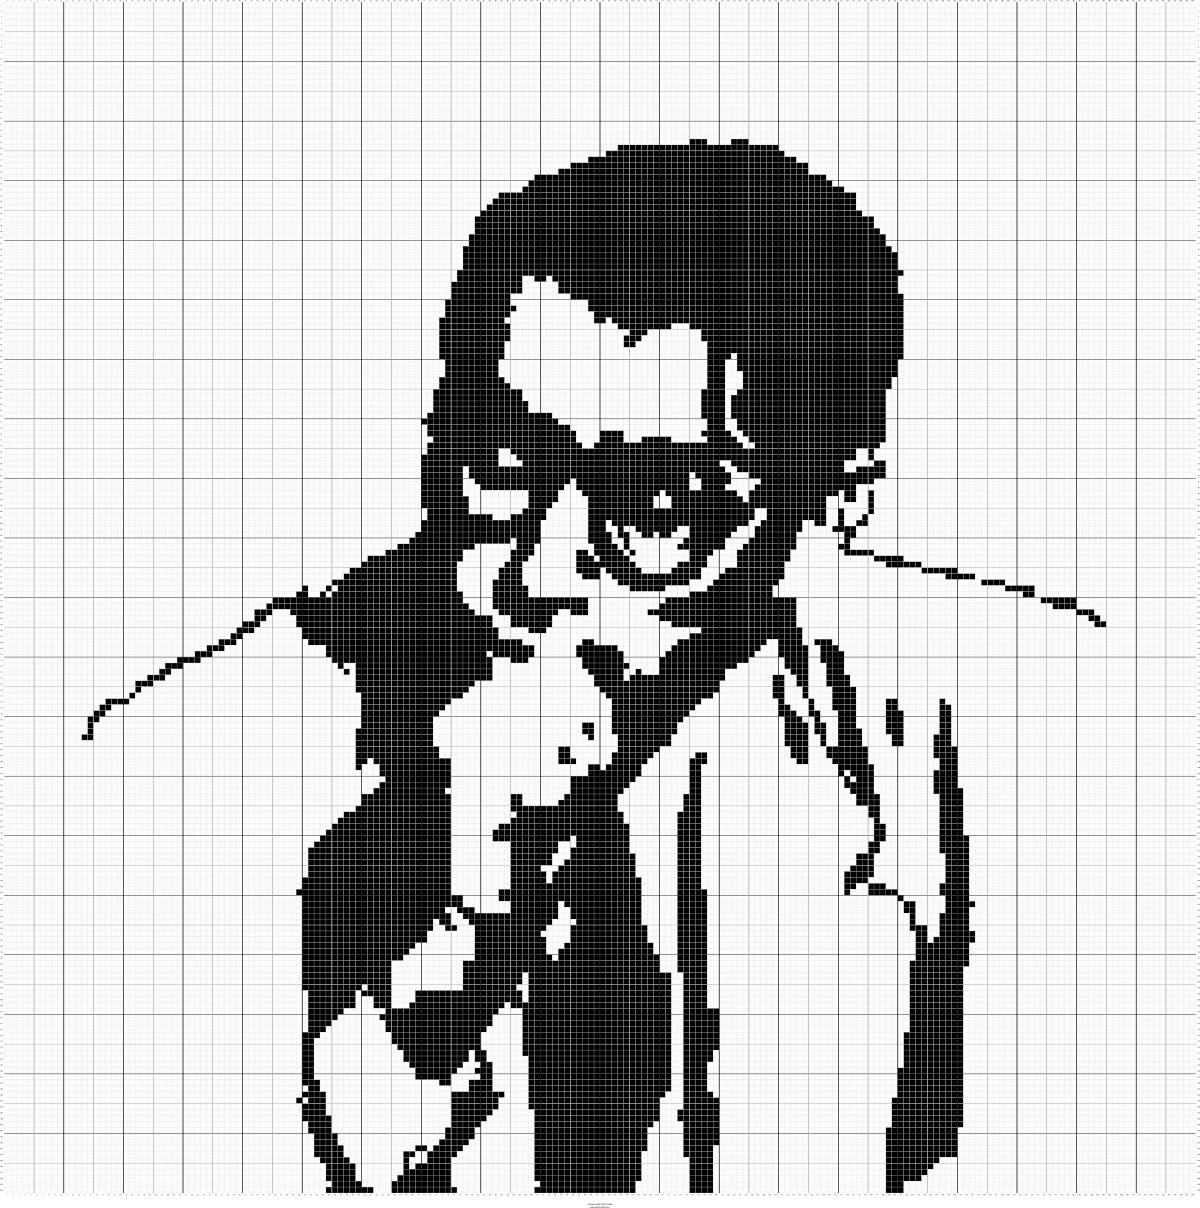 Atticus Finch To Kill A Mockingbird Silhouette Cross Stitch